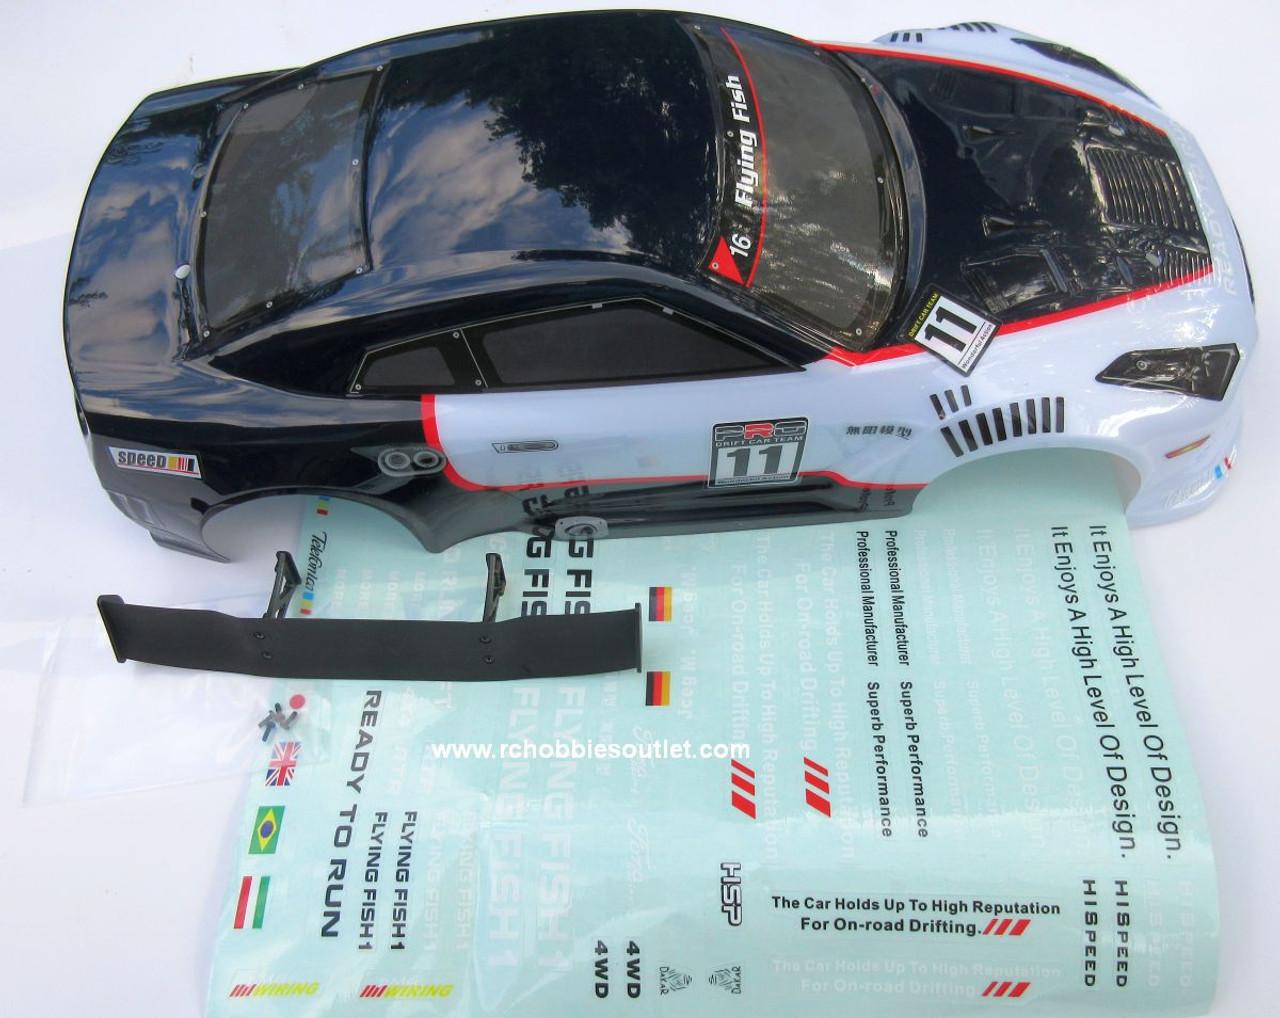 GTR-2   RC Car Body Shell 1/10 Scale  HSP, Redcat, etc